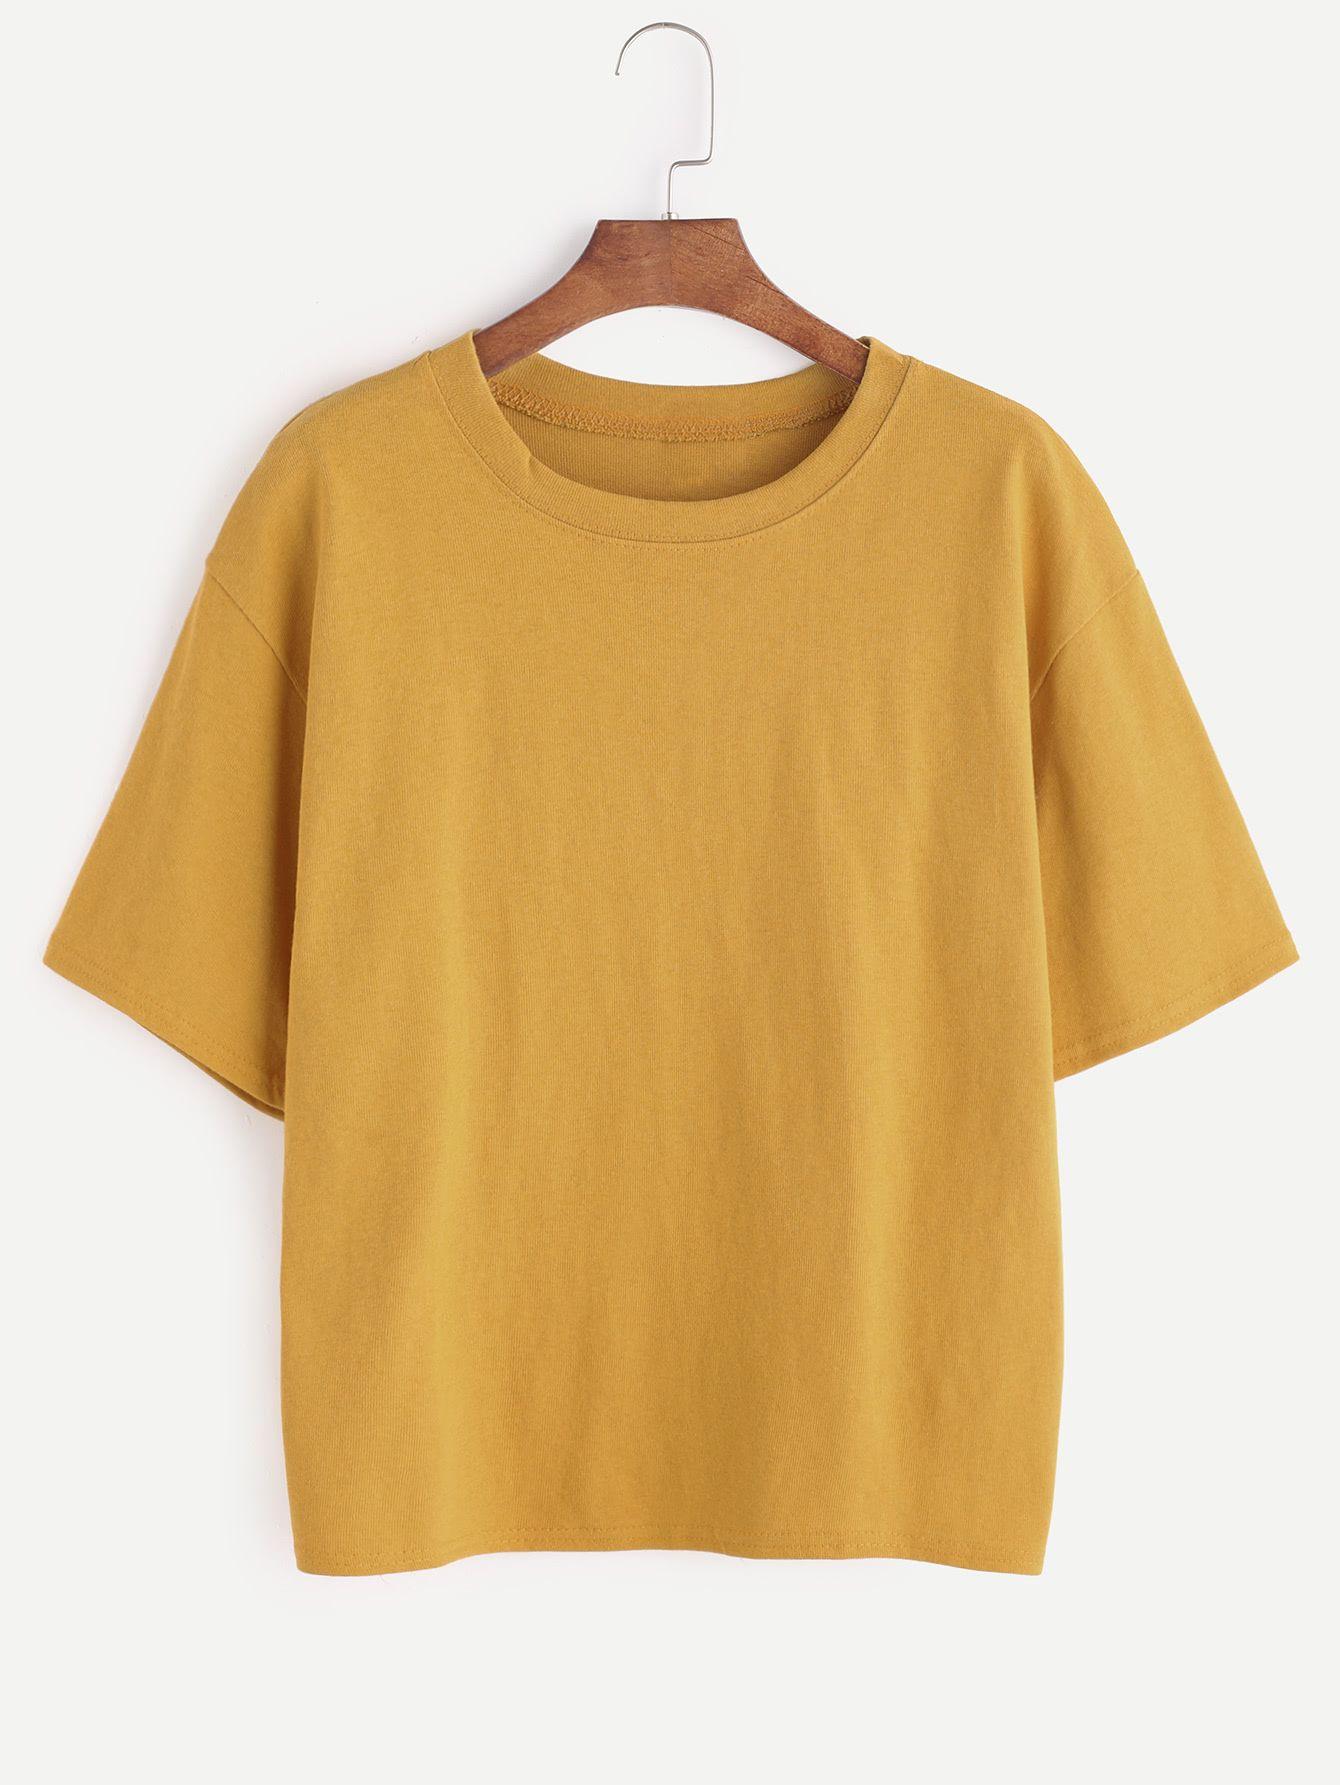 Yellow Aesthetic Shirts - Nils Stucki Kieferorthopäde